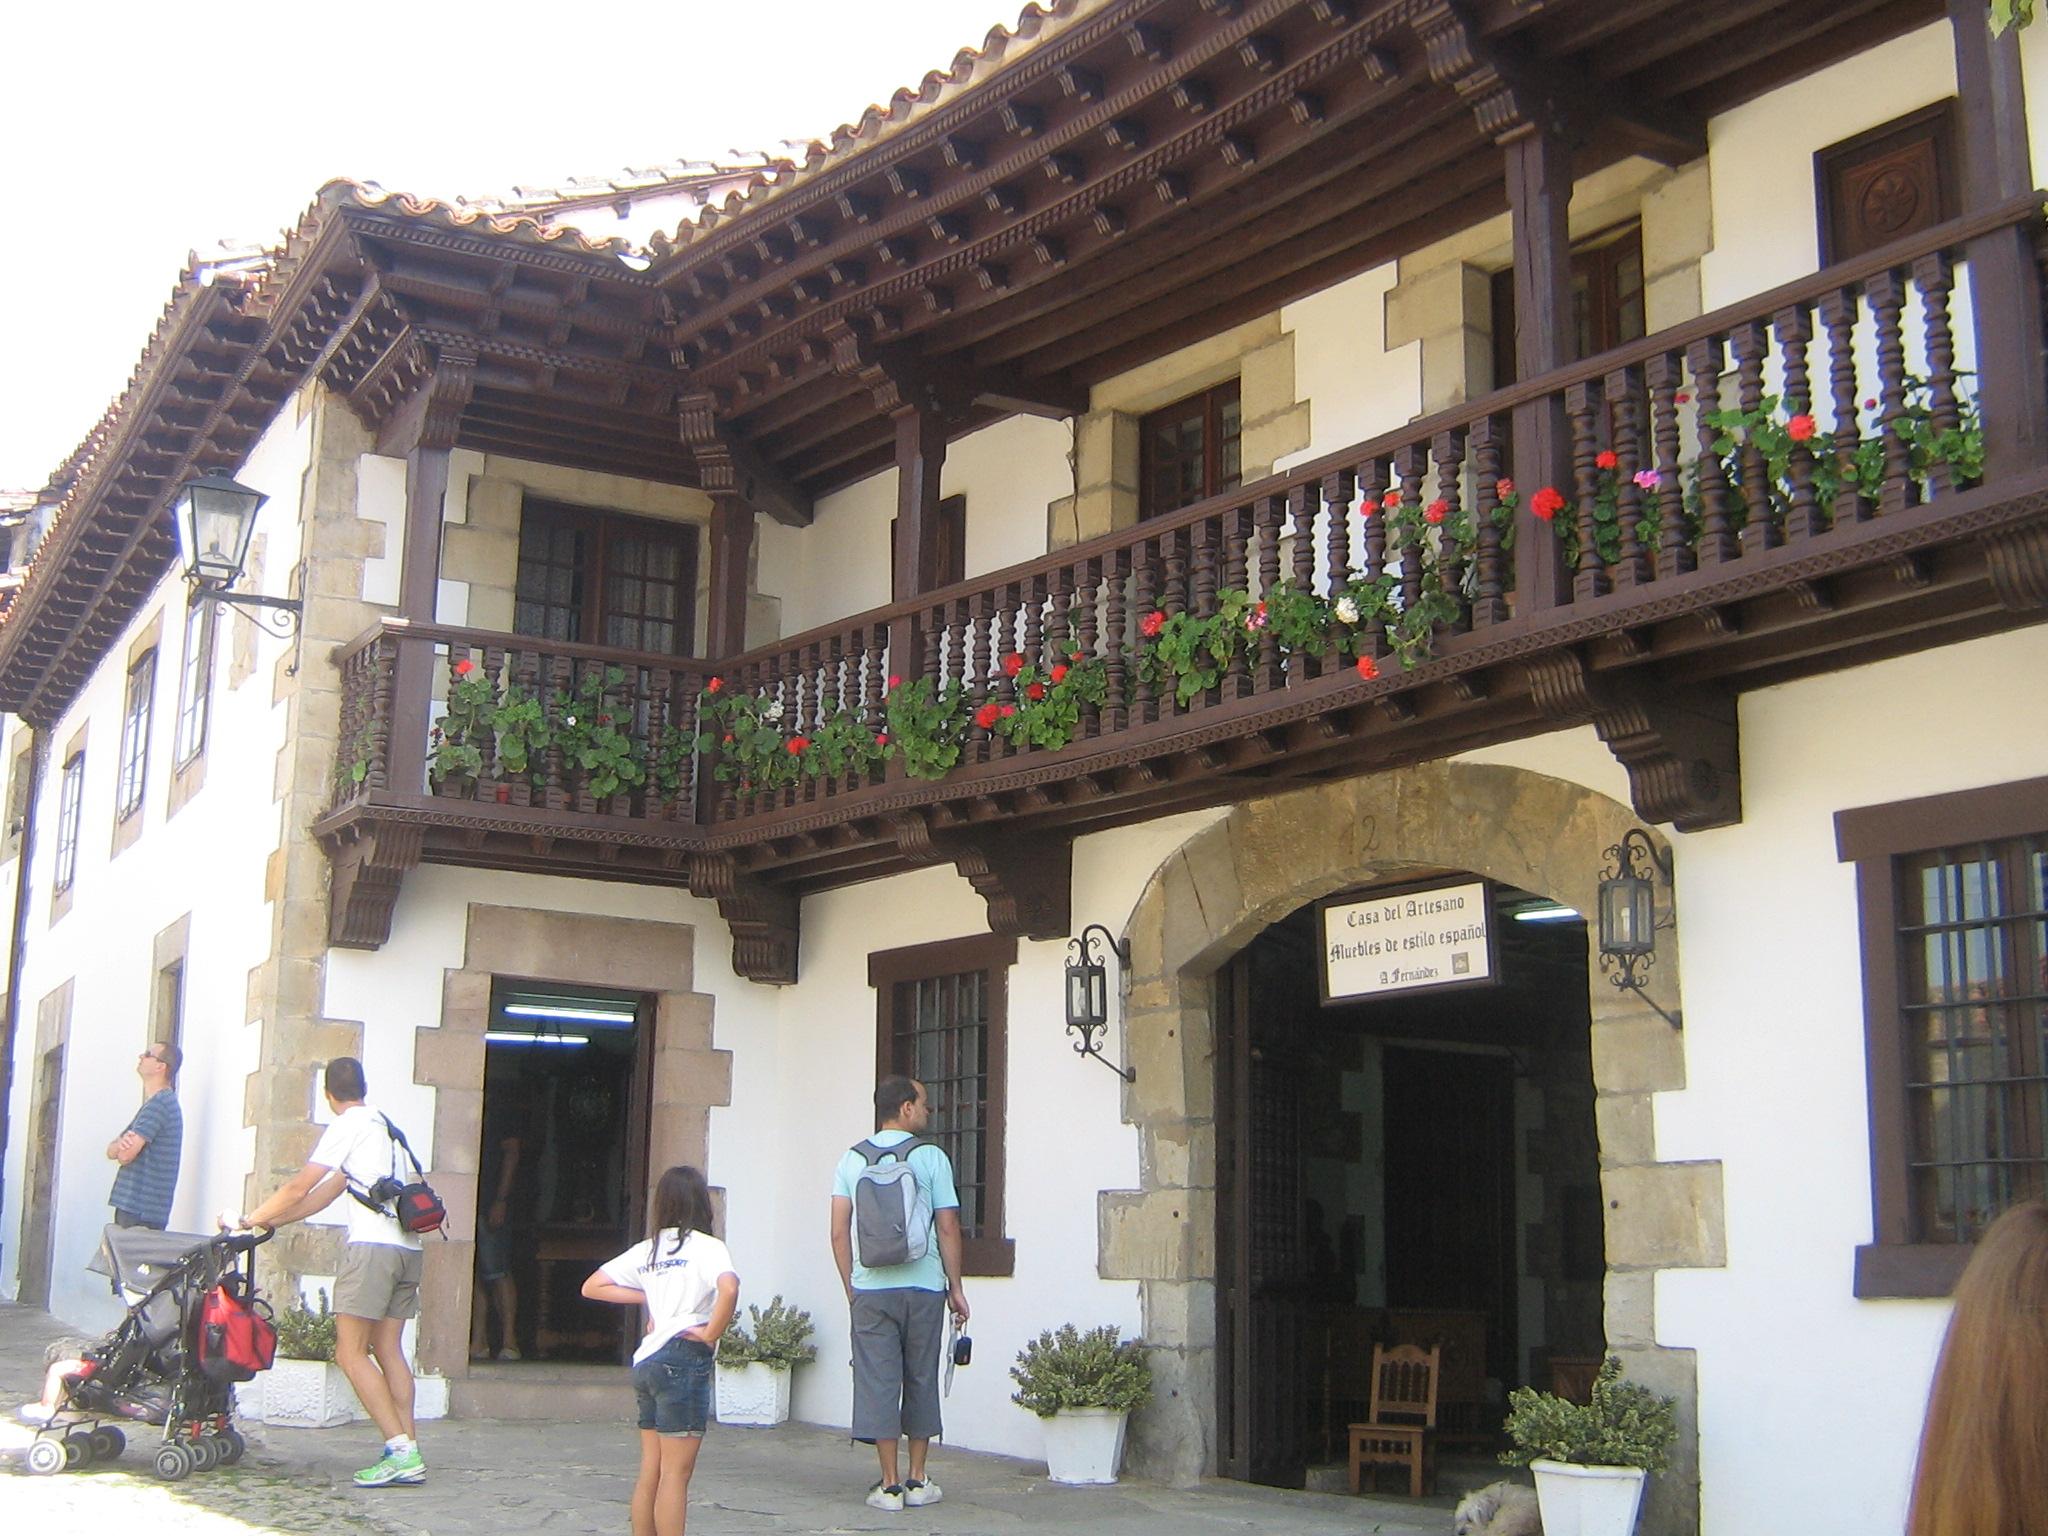 File:Casa del Artesano en Santillana del Mar.JPG - Wikimedia Commons